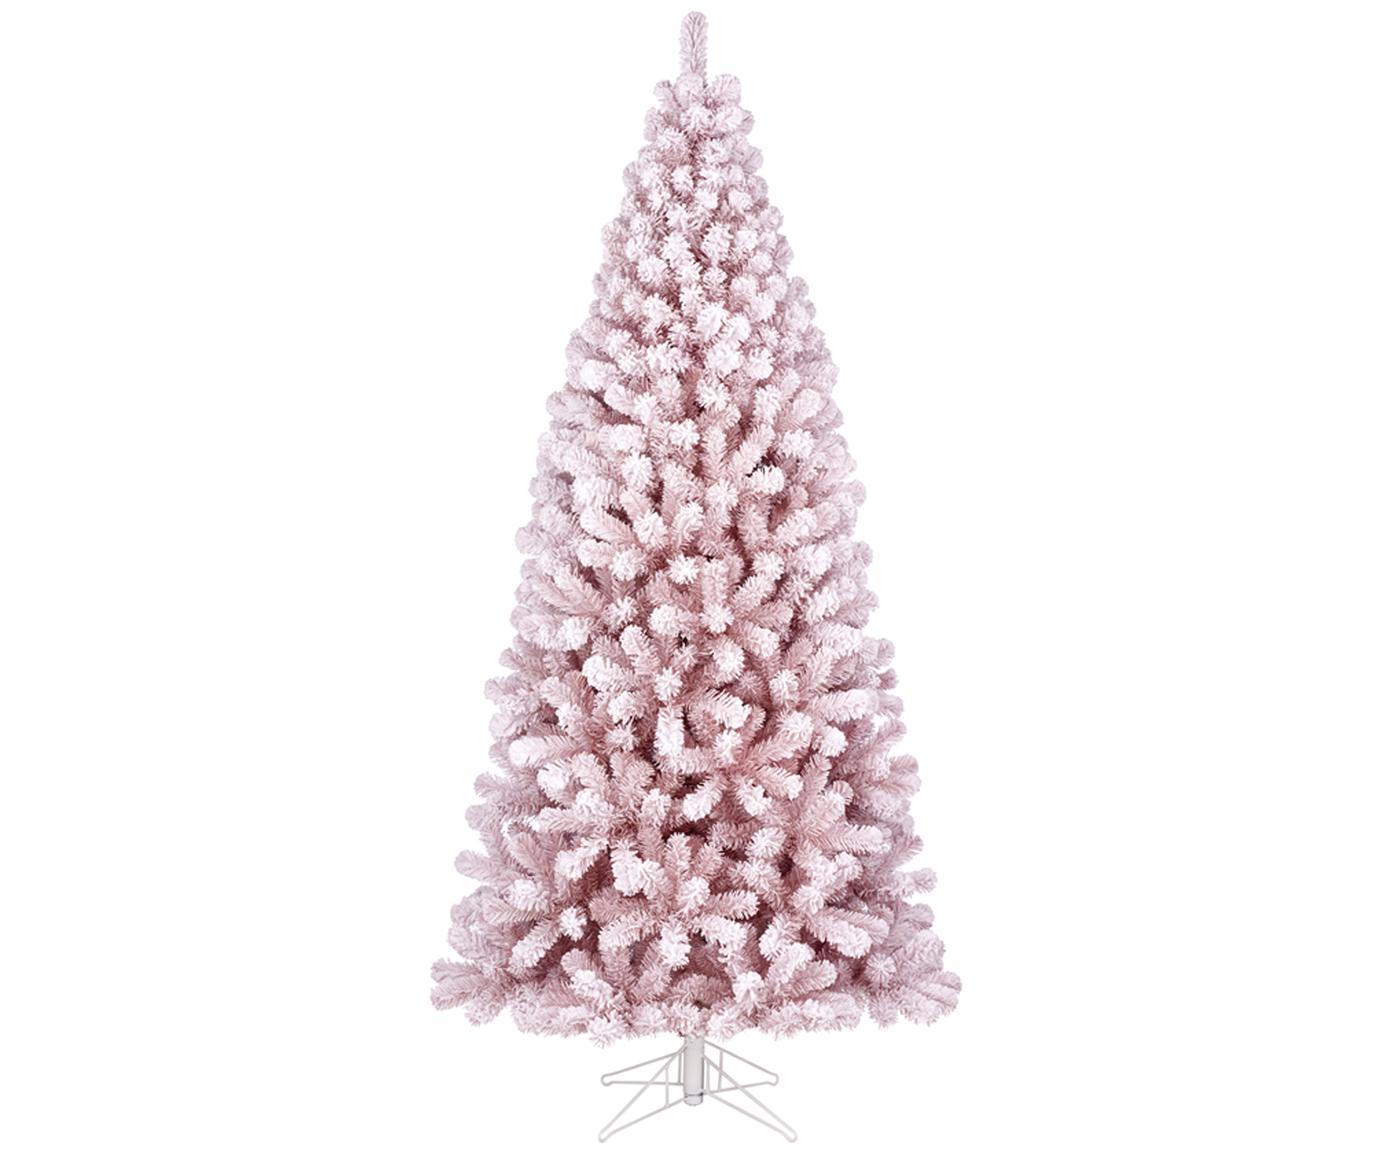 Decoratieve kerstboom Cembra, Roze, Ø 94 x H 185 cm